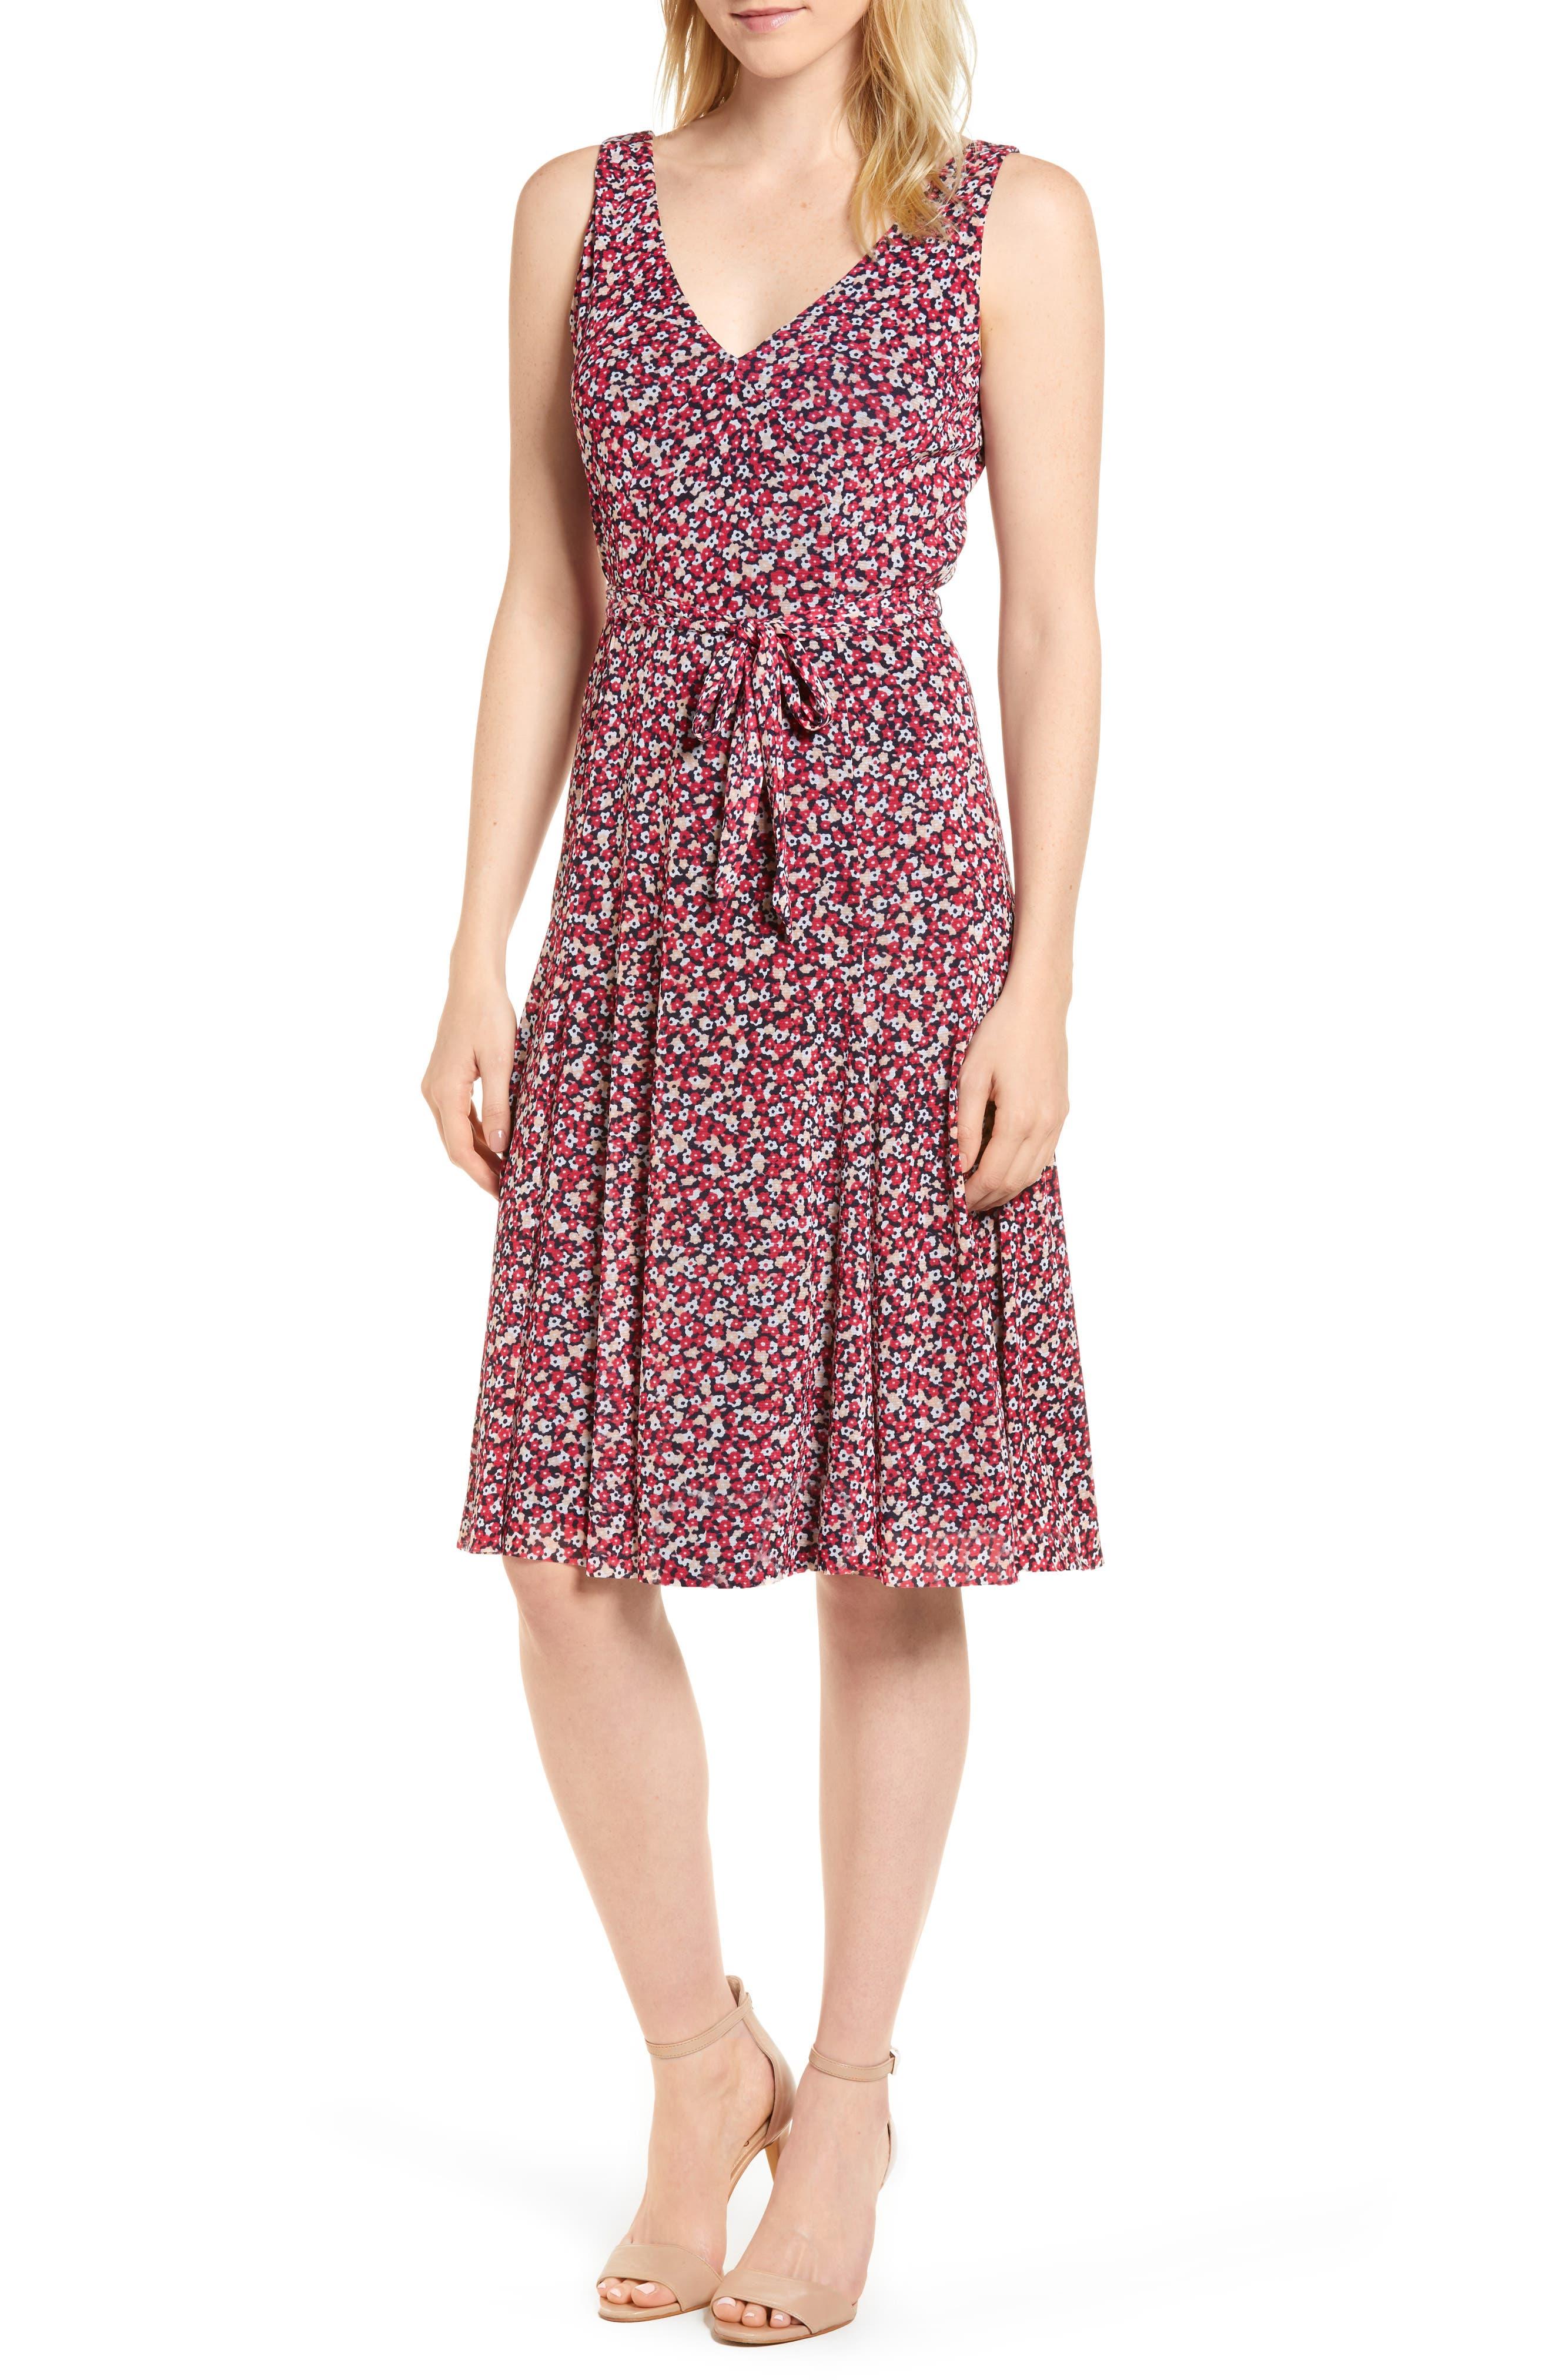 Floral Tank Dress,                             Main thumbnail 1, color,                             True Navy/ Bright Blush